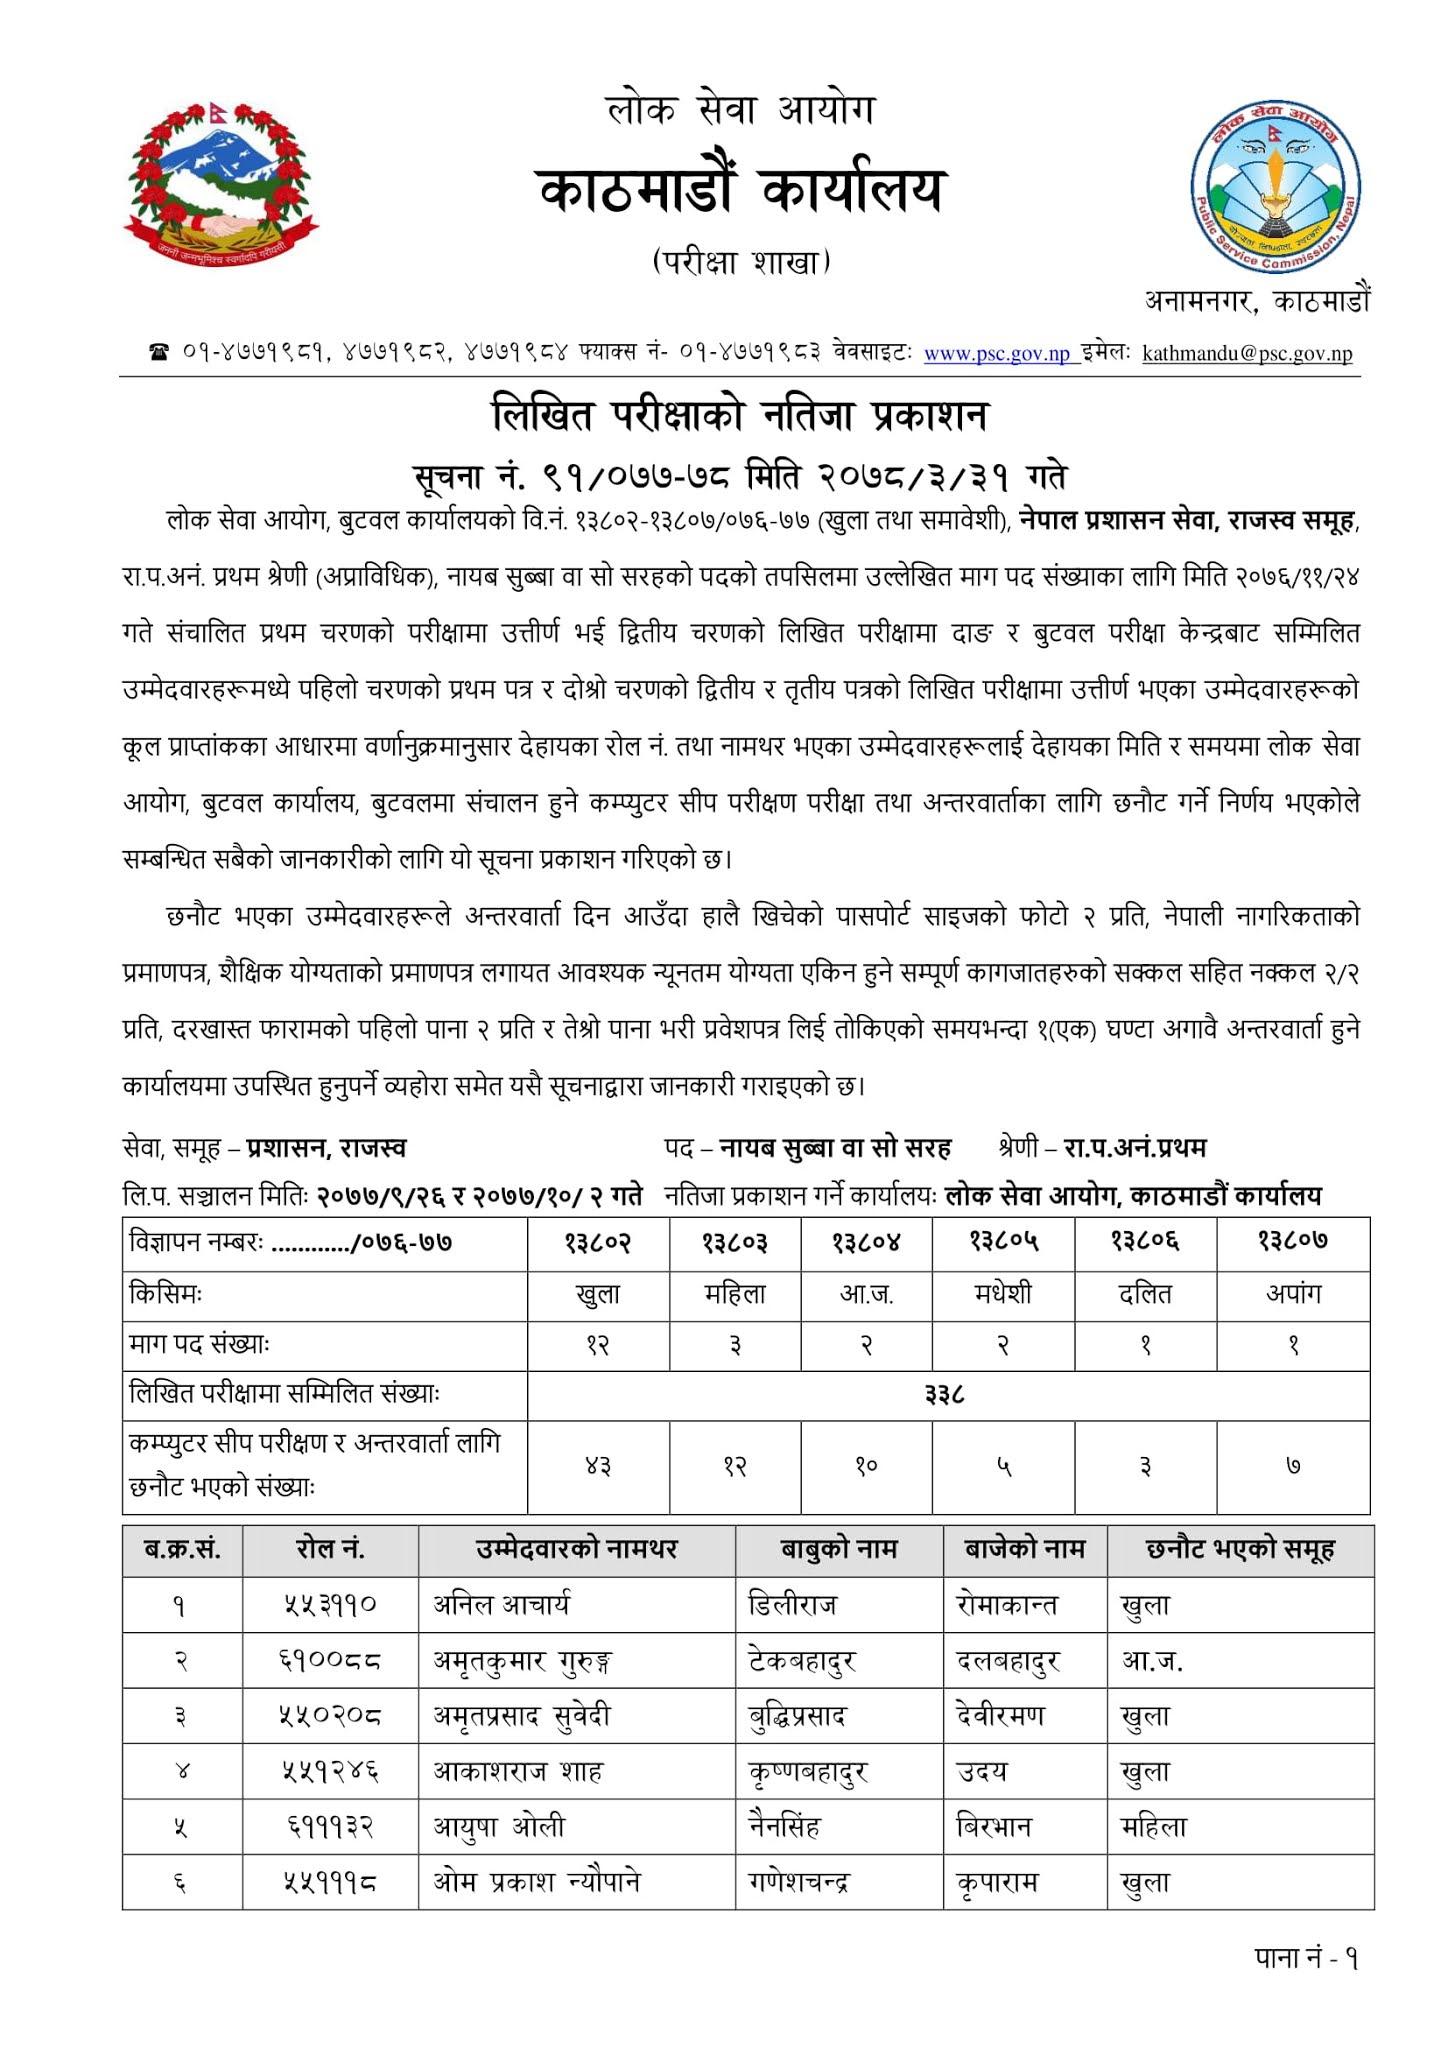 Butwal Lok Sewa Aayog Written Exam Result & Exam Schedule of NASU Revenue published by Kathmandu Lok Sewa Aayog